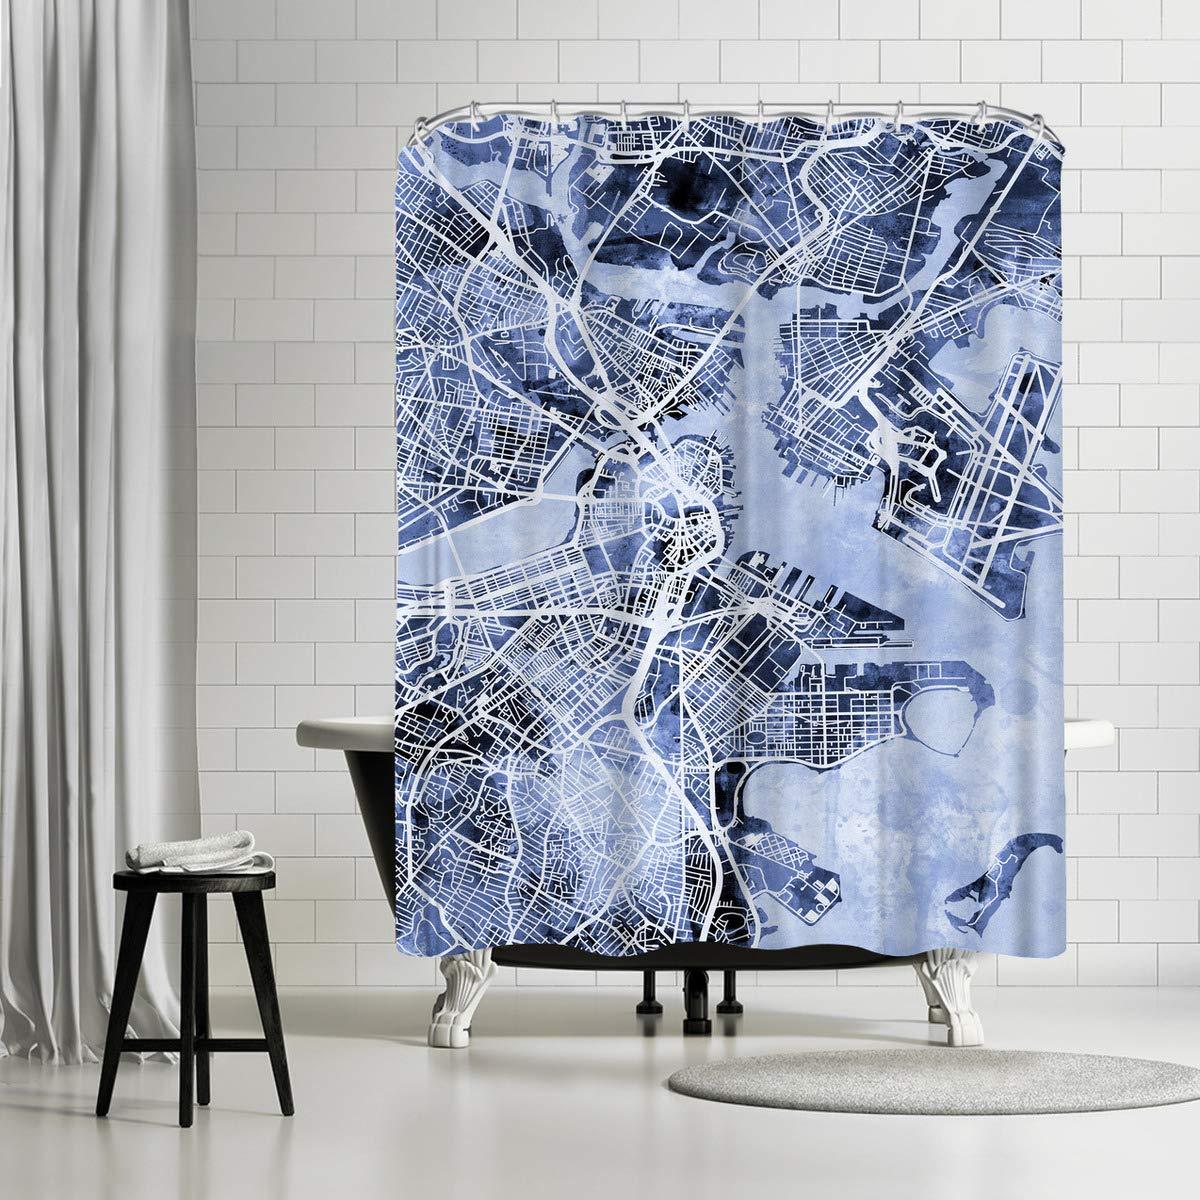 American Flat Boston Massachusetts Street Map New 6'' Art Pause Shower Curtain by Michael Tompsett, 71'' x 74''